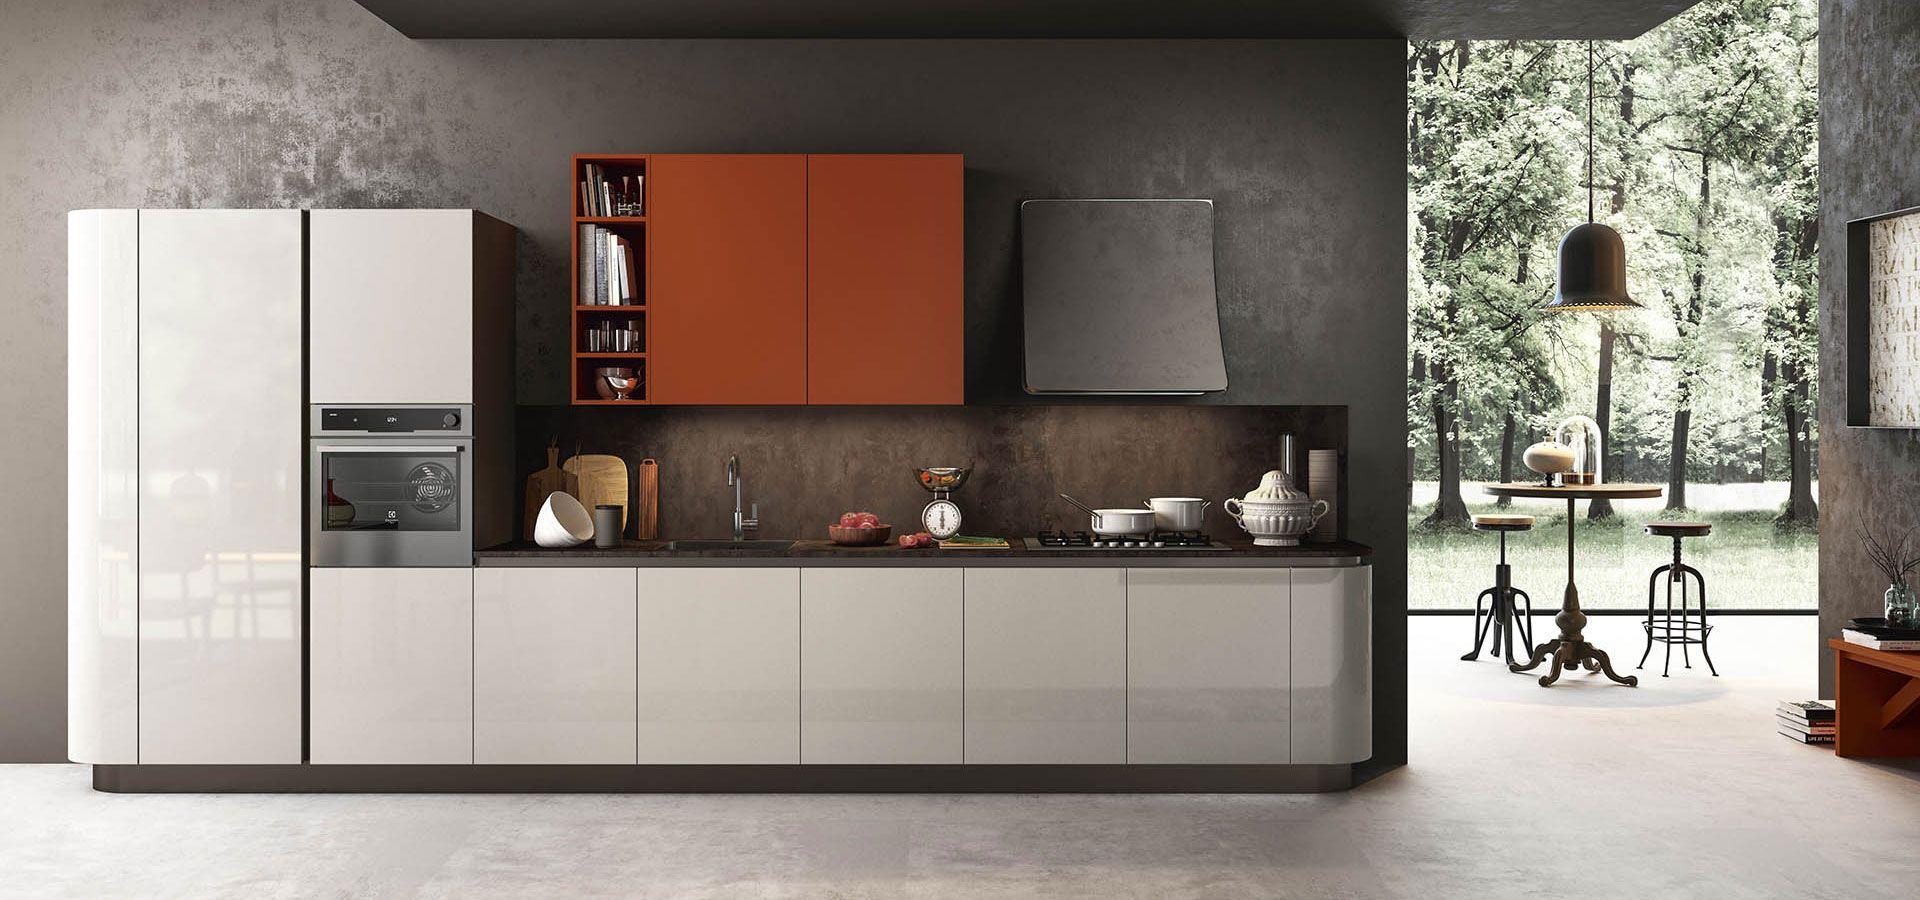 Mattoni Cucina Moderna Simple Gallery Of Cucina Rustica Cu Ce Mur Cucine In Muratura Piastrelle